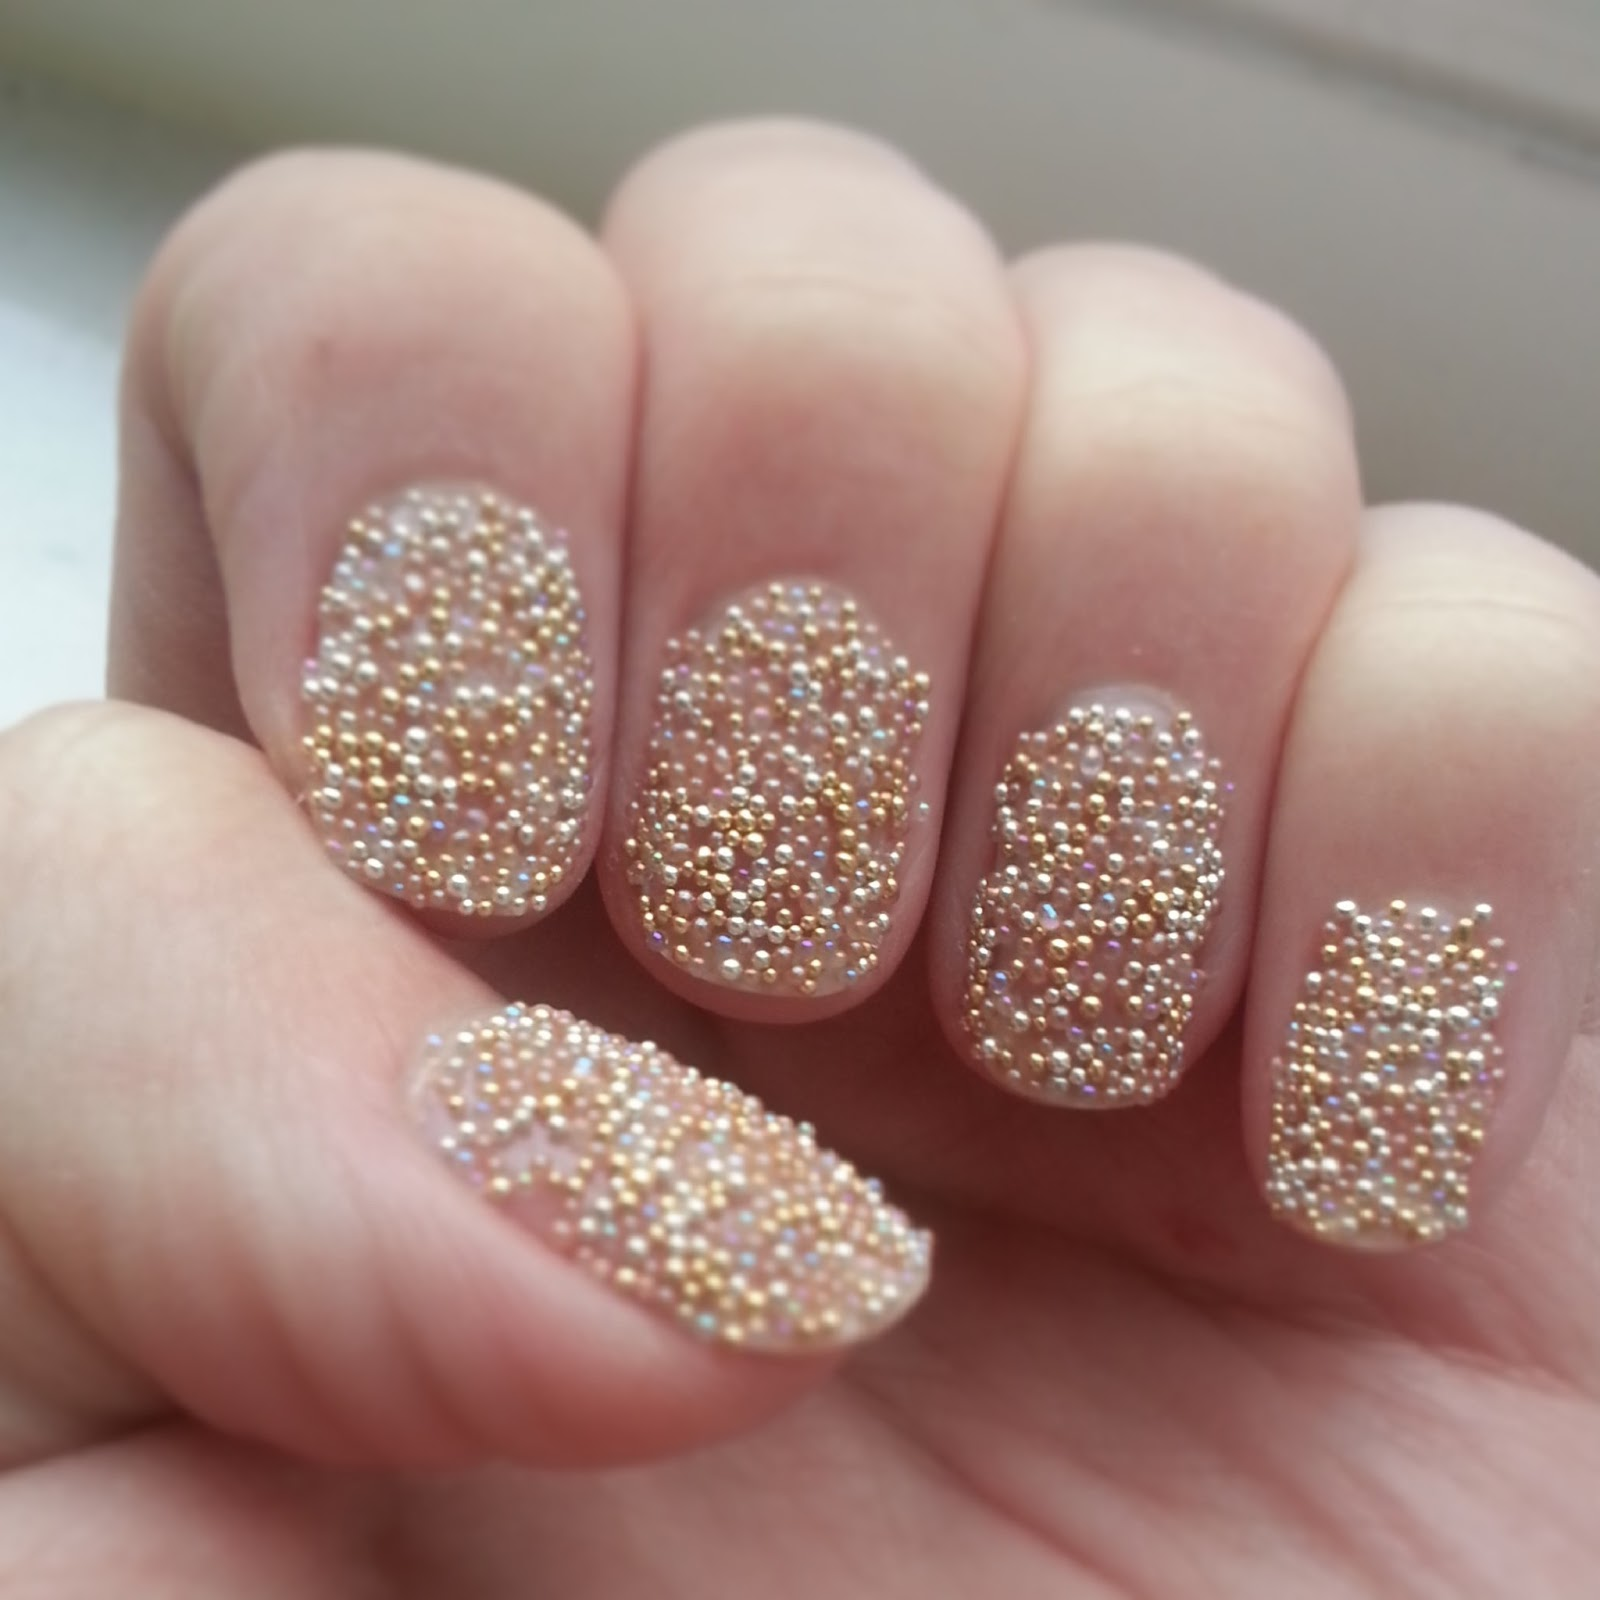 Ciate Caviar Nails: Ciate Caviar Nails!